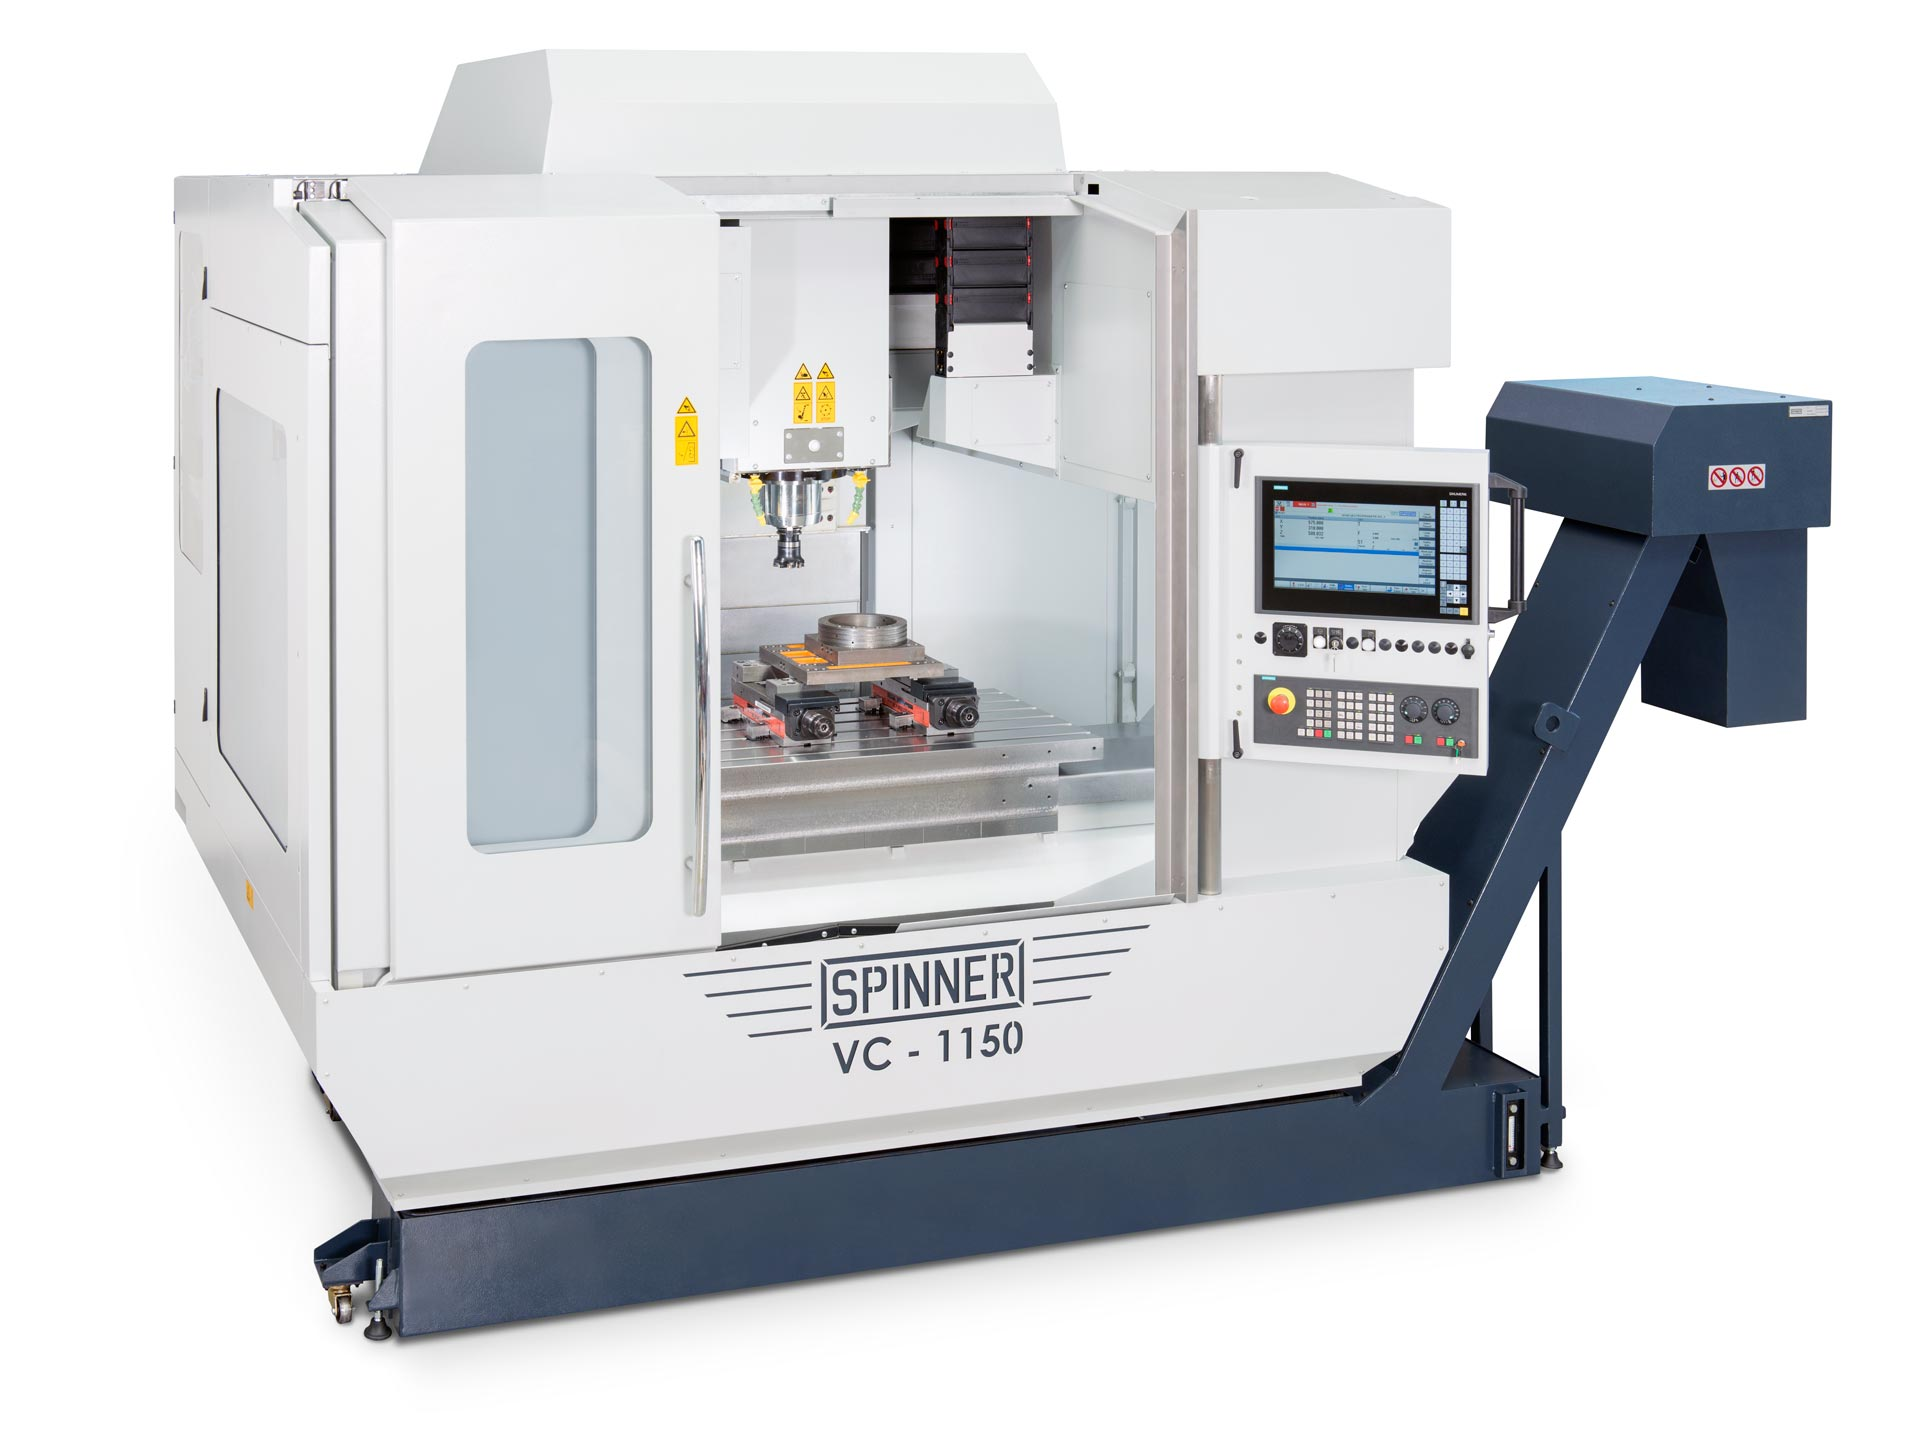 Spinner AG - Hochleistungsbearbeitungszentrum VC1150 Compact